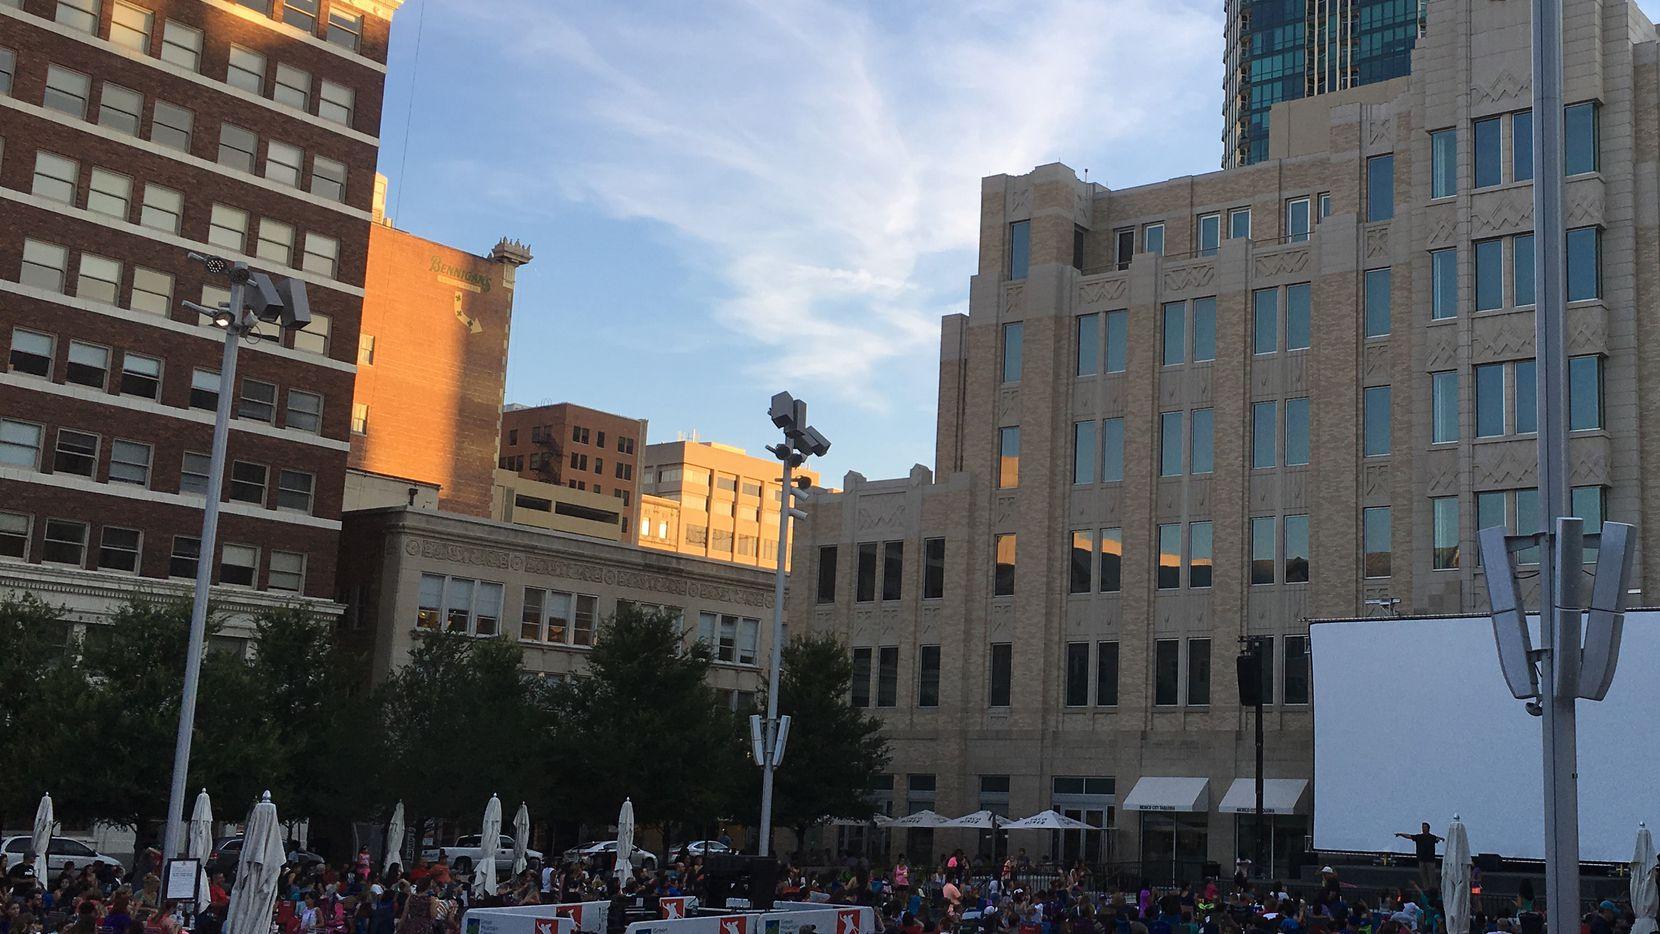 Sundance Square Plaza in Fort Worth